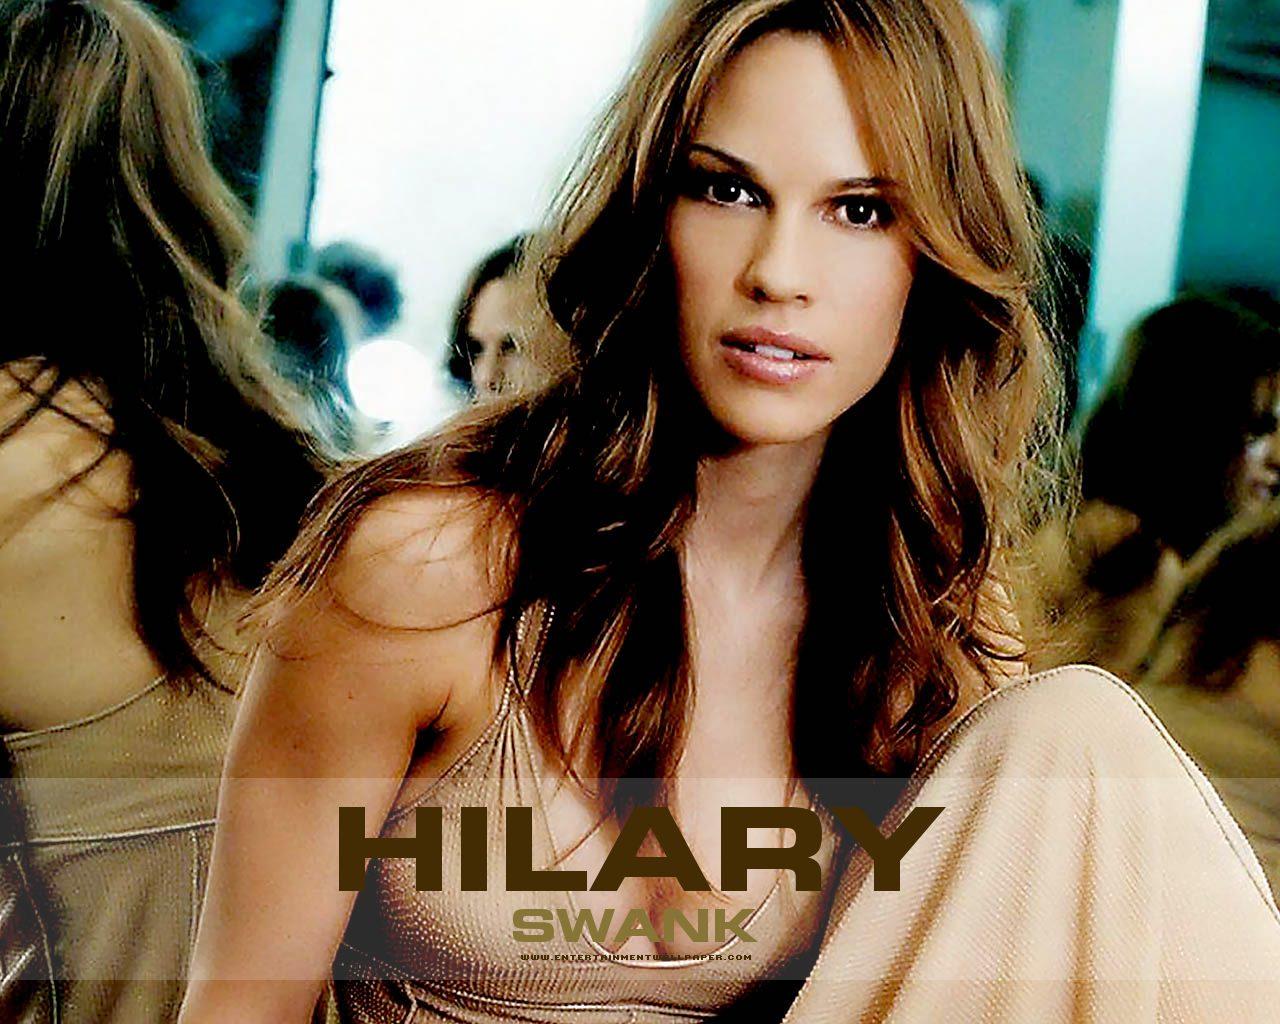 Hilary-Swank-http-www-wallarena-com-hilary-swank-html-wallpaper-wp6003888